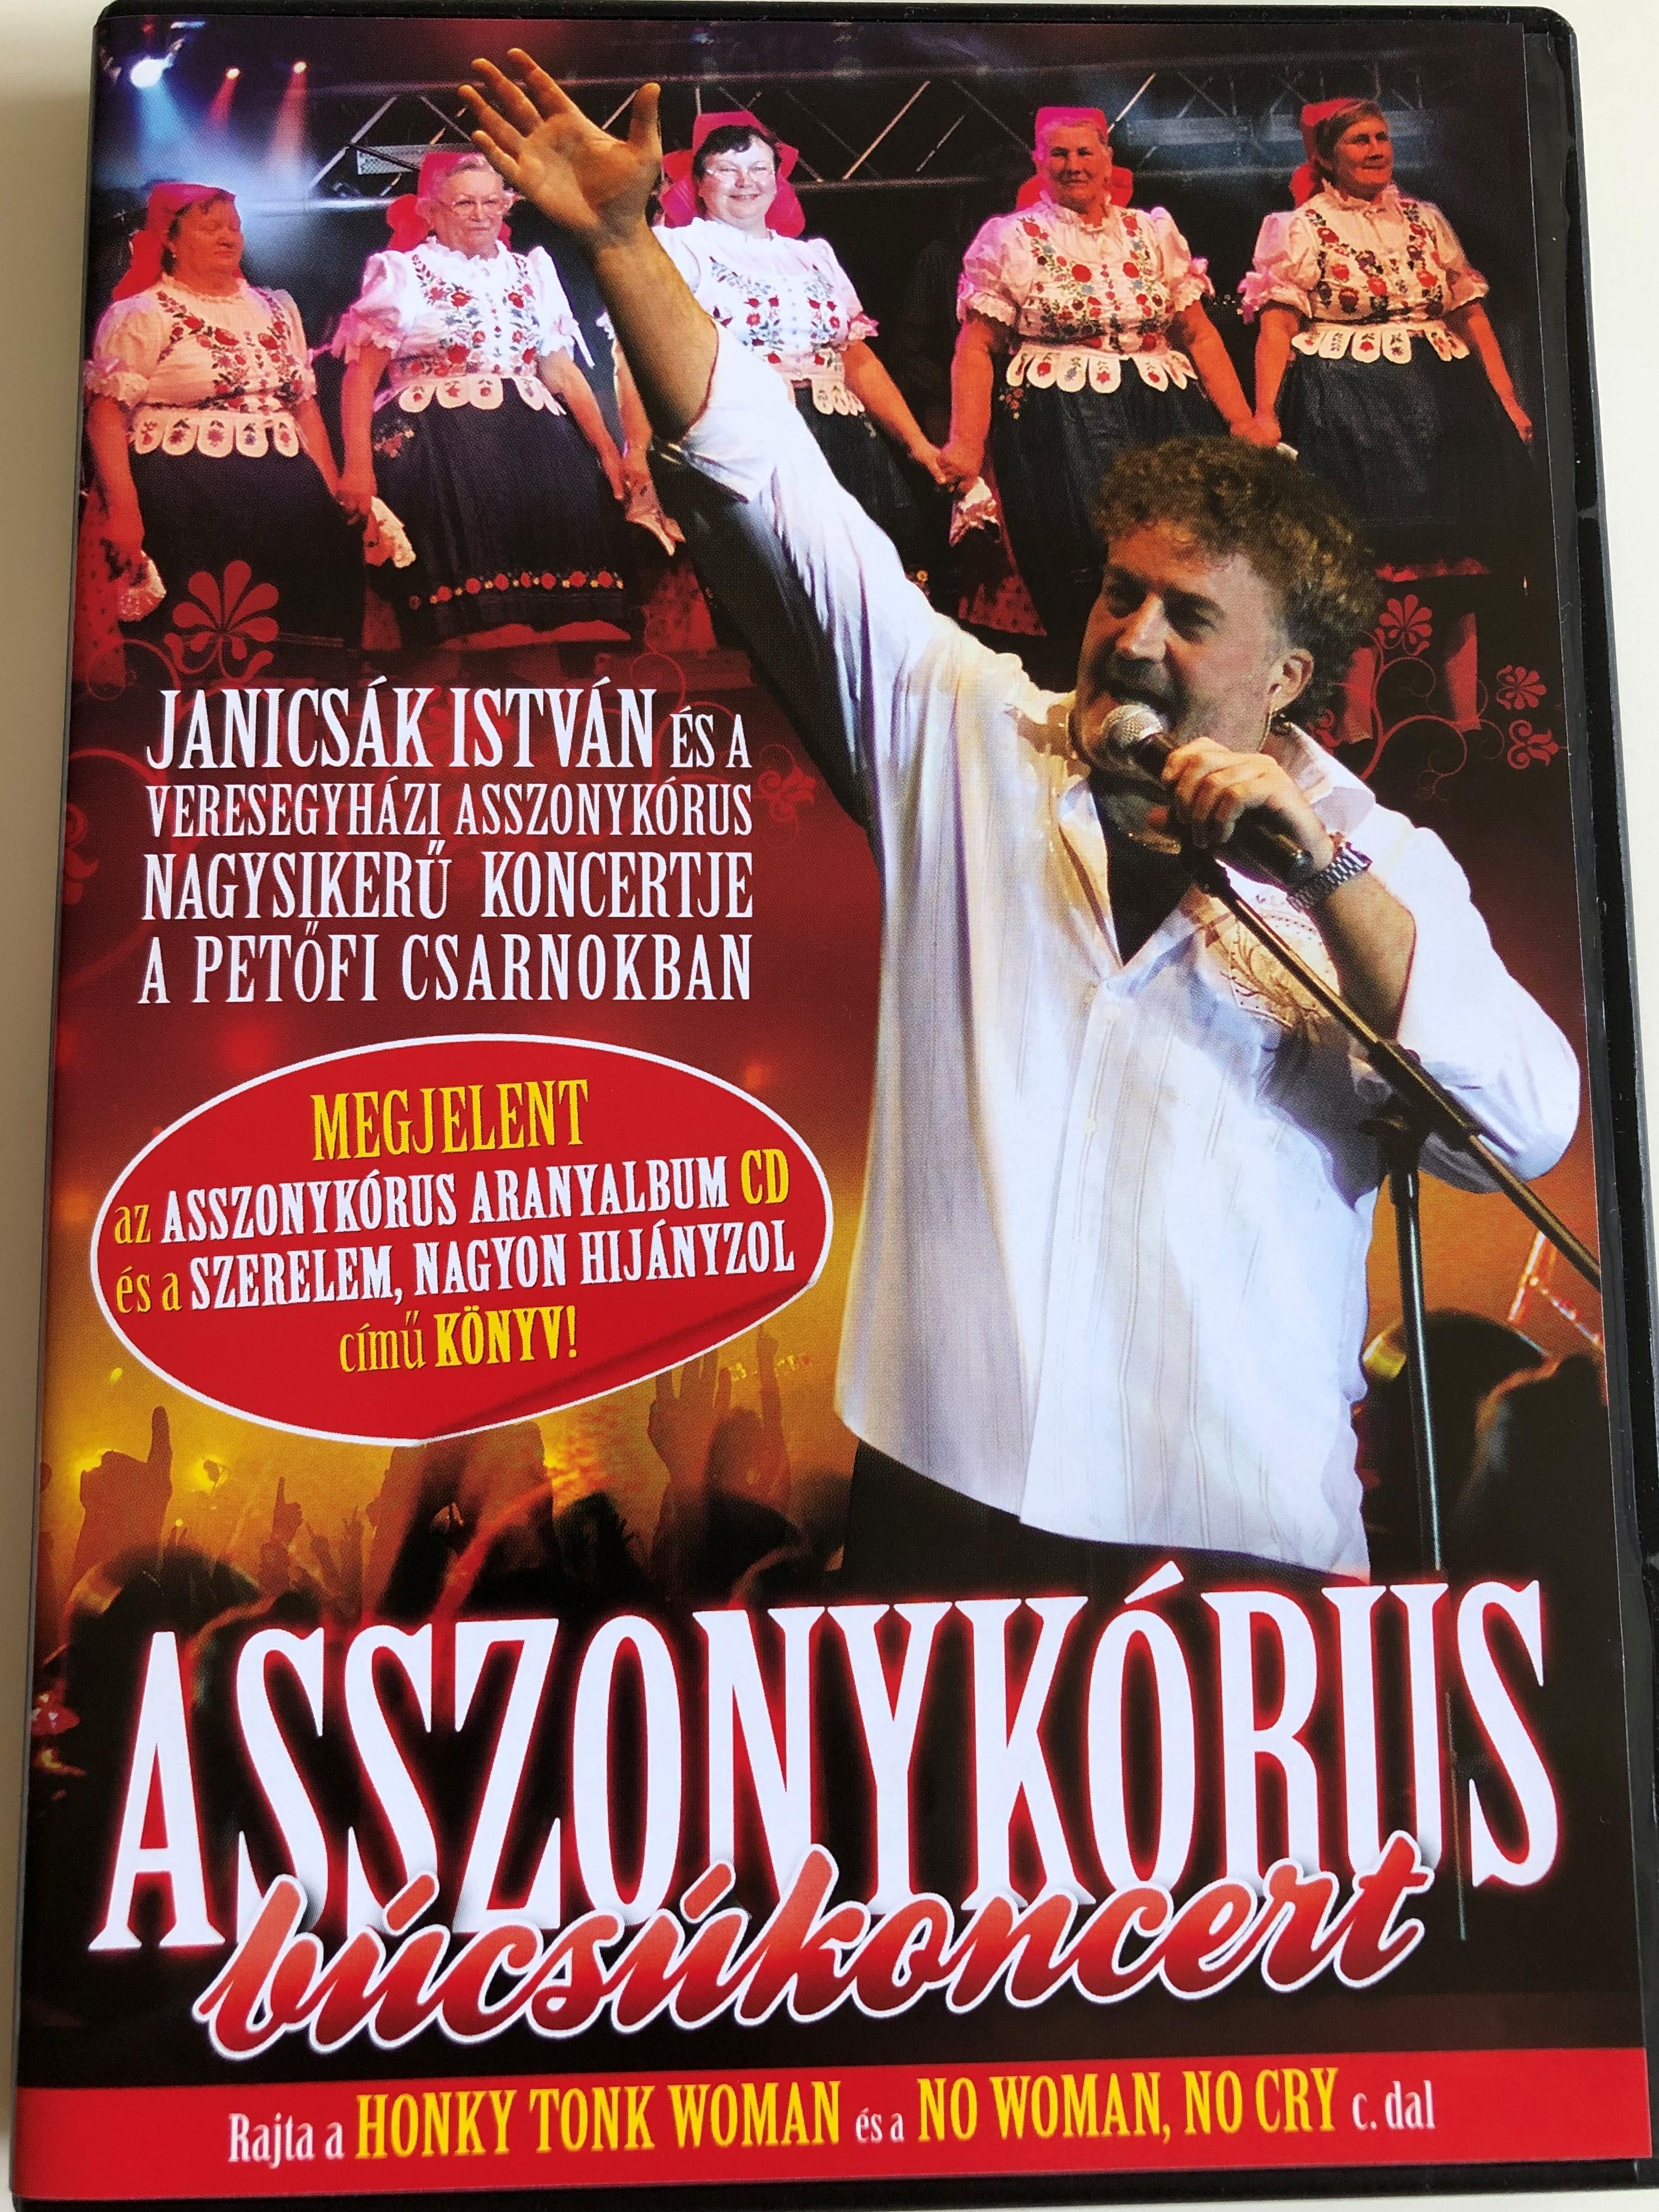 janics-k-istv-n-s-a-veresegyh-zi-asszonyk-rus-dvd-2009-b-cs-koncert-recorded-in-2008-in-pet-fi-hall-budapest-1-.jpg